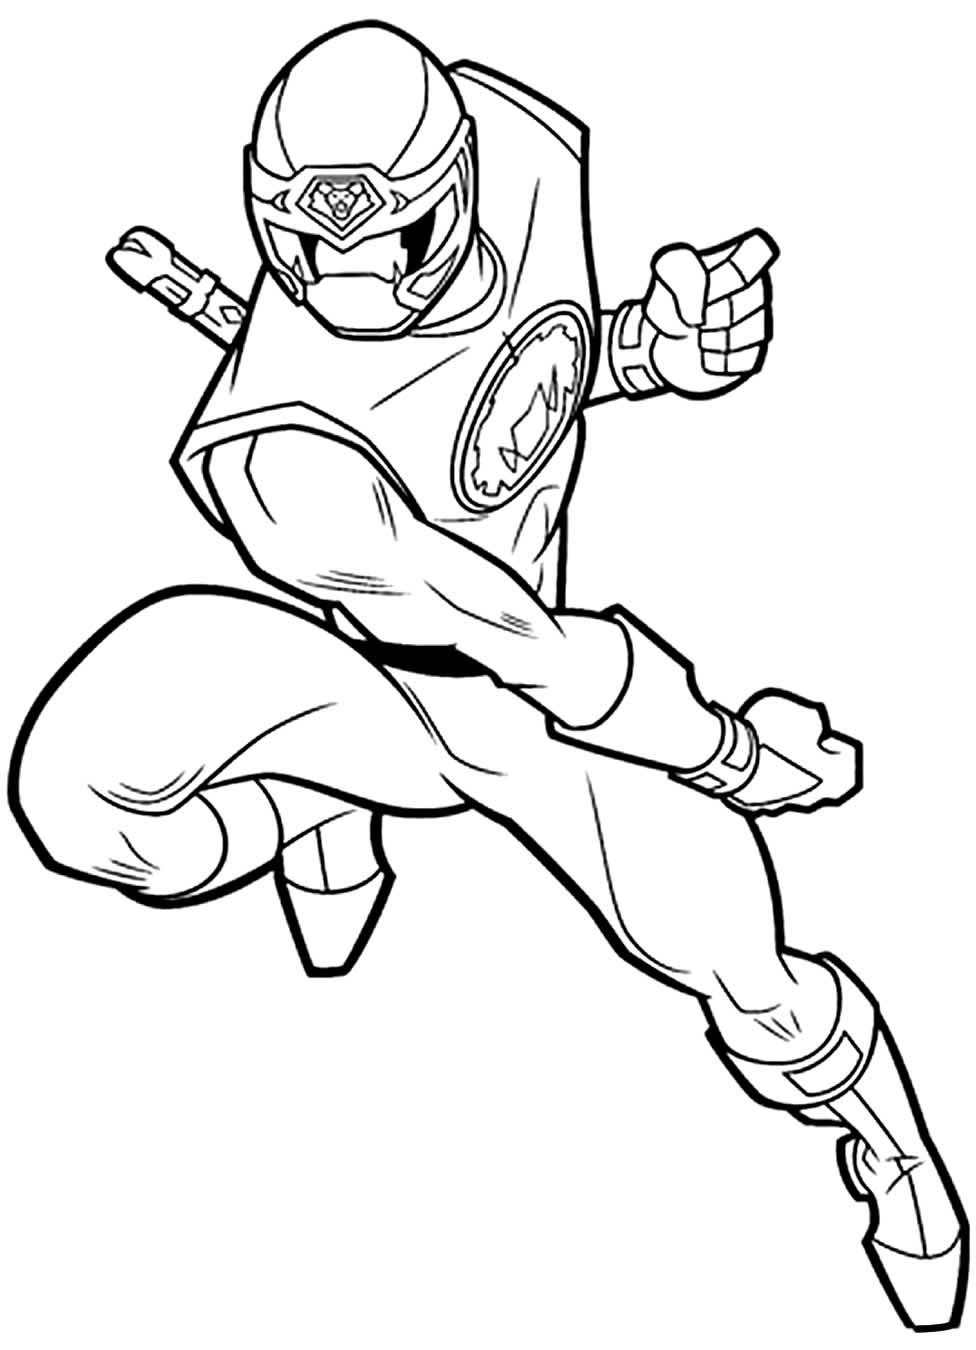 Imagem de Power Rangers para pintar